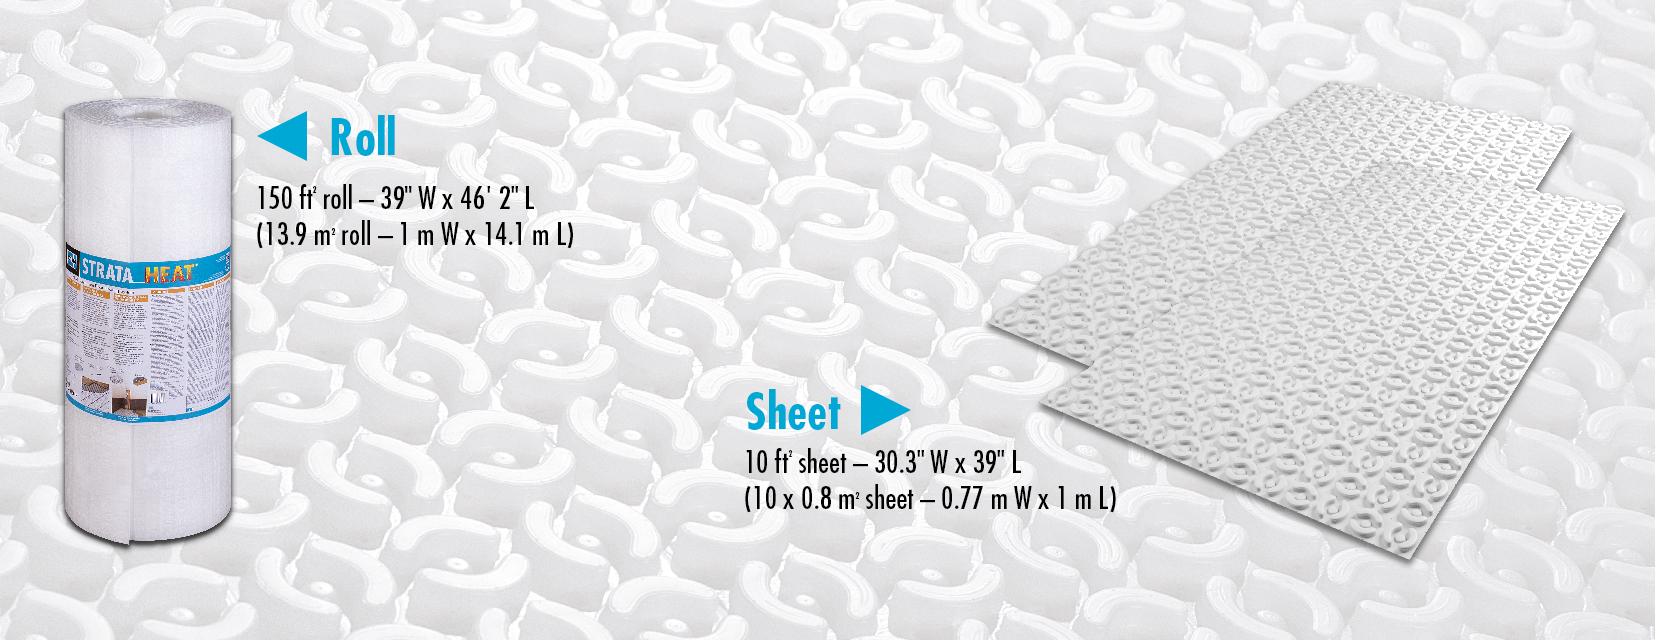 Strata Heat Mat